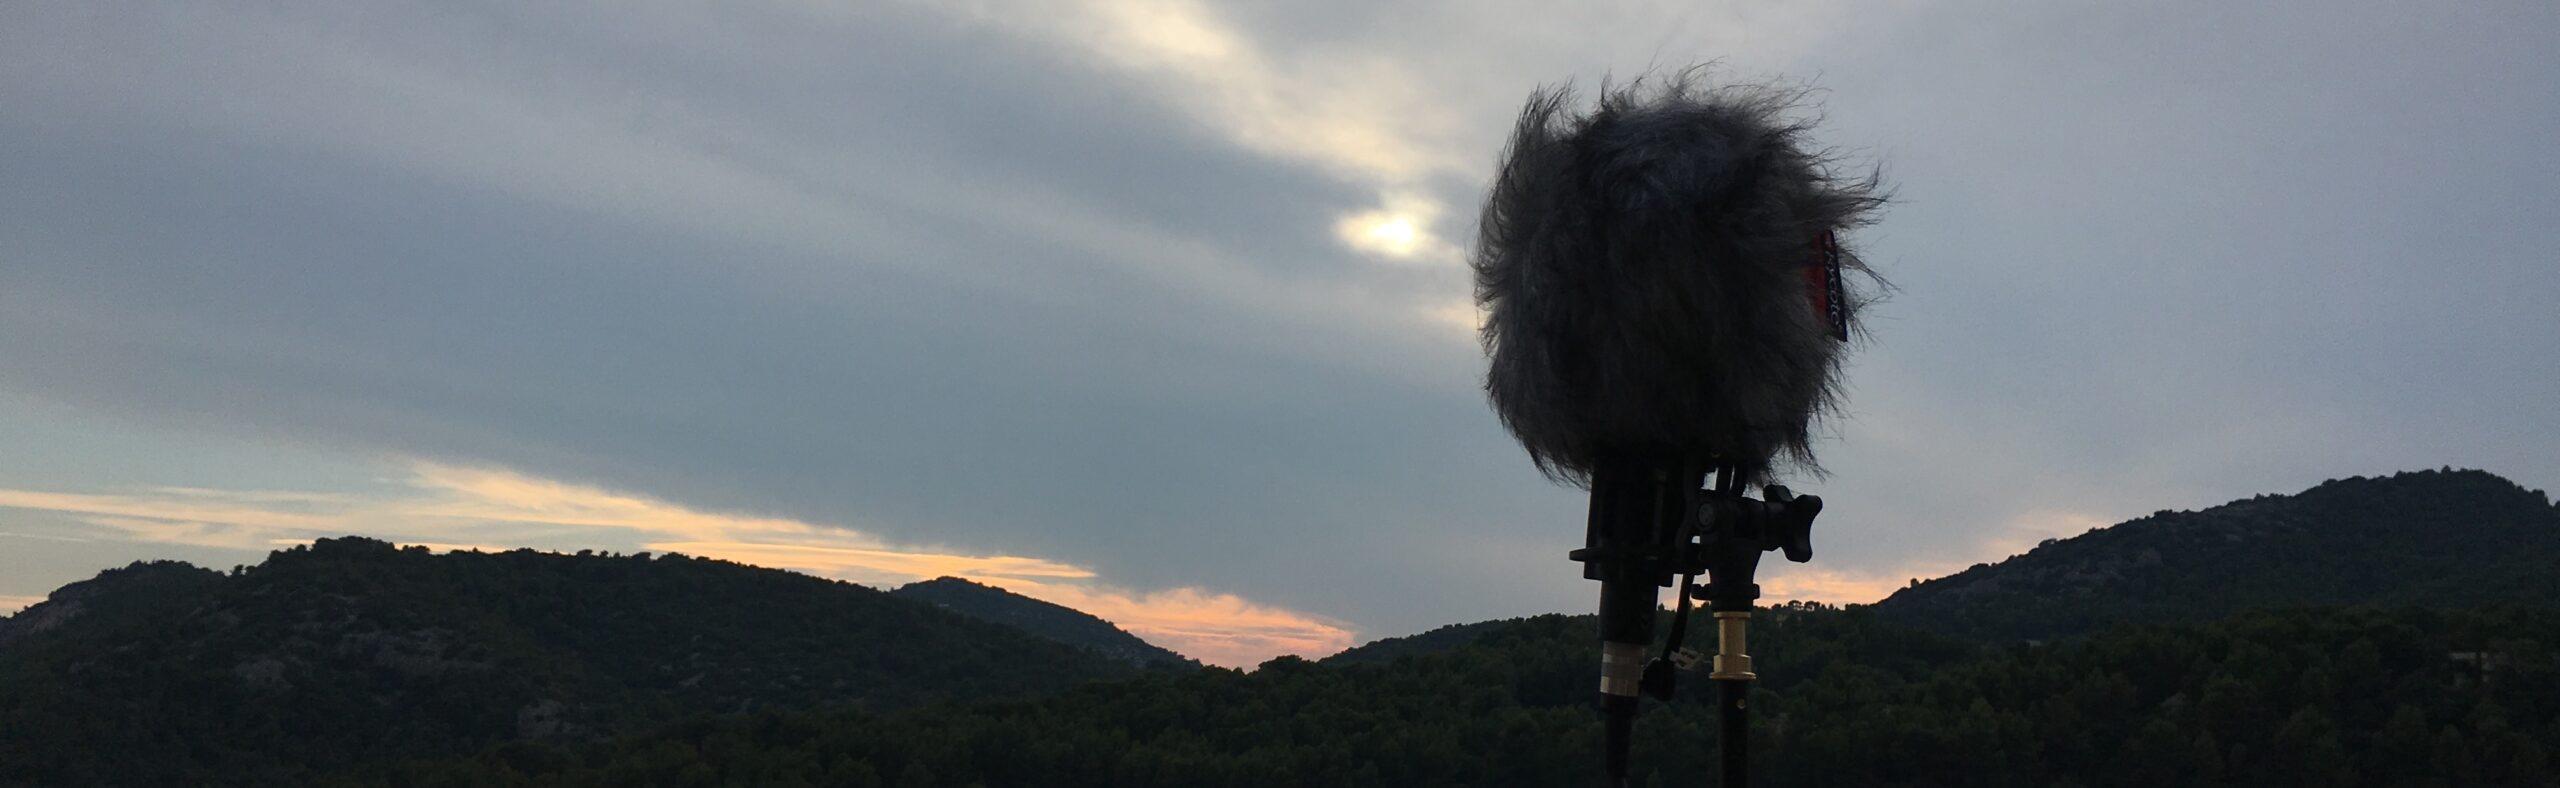 firled recording ambisonic